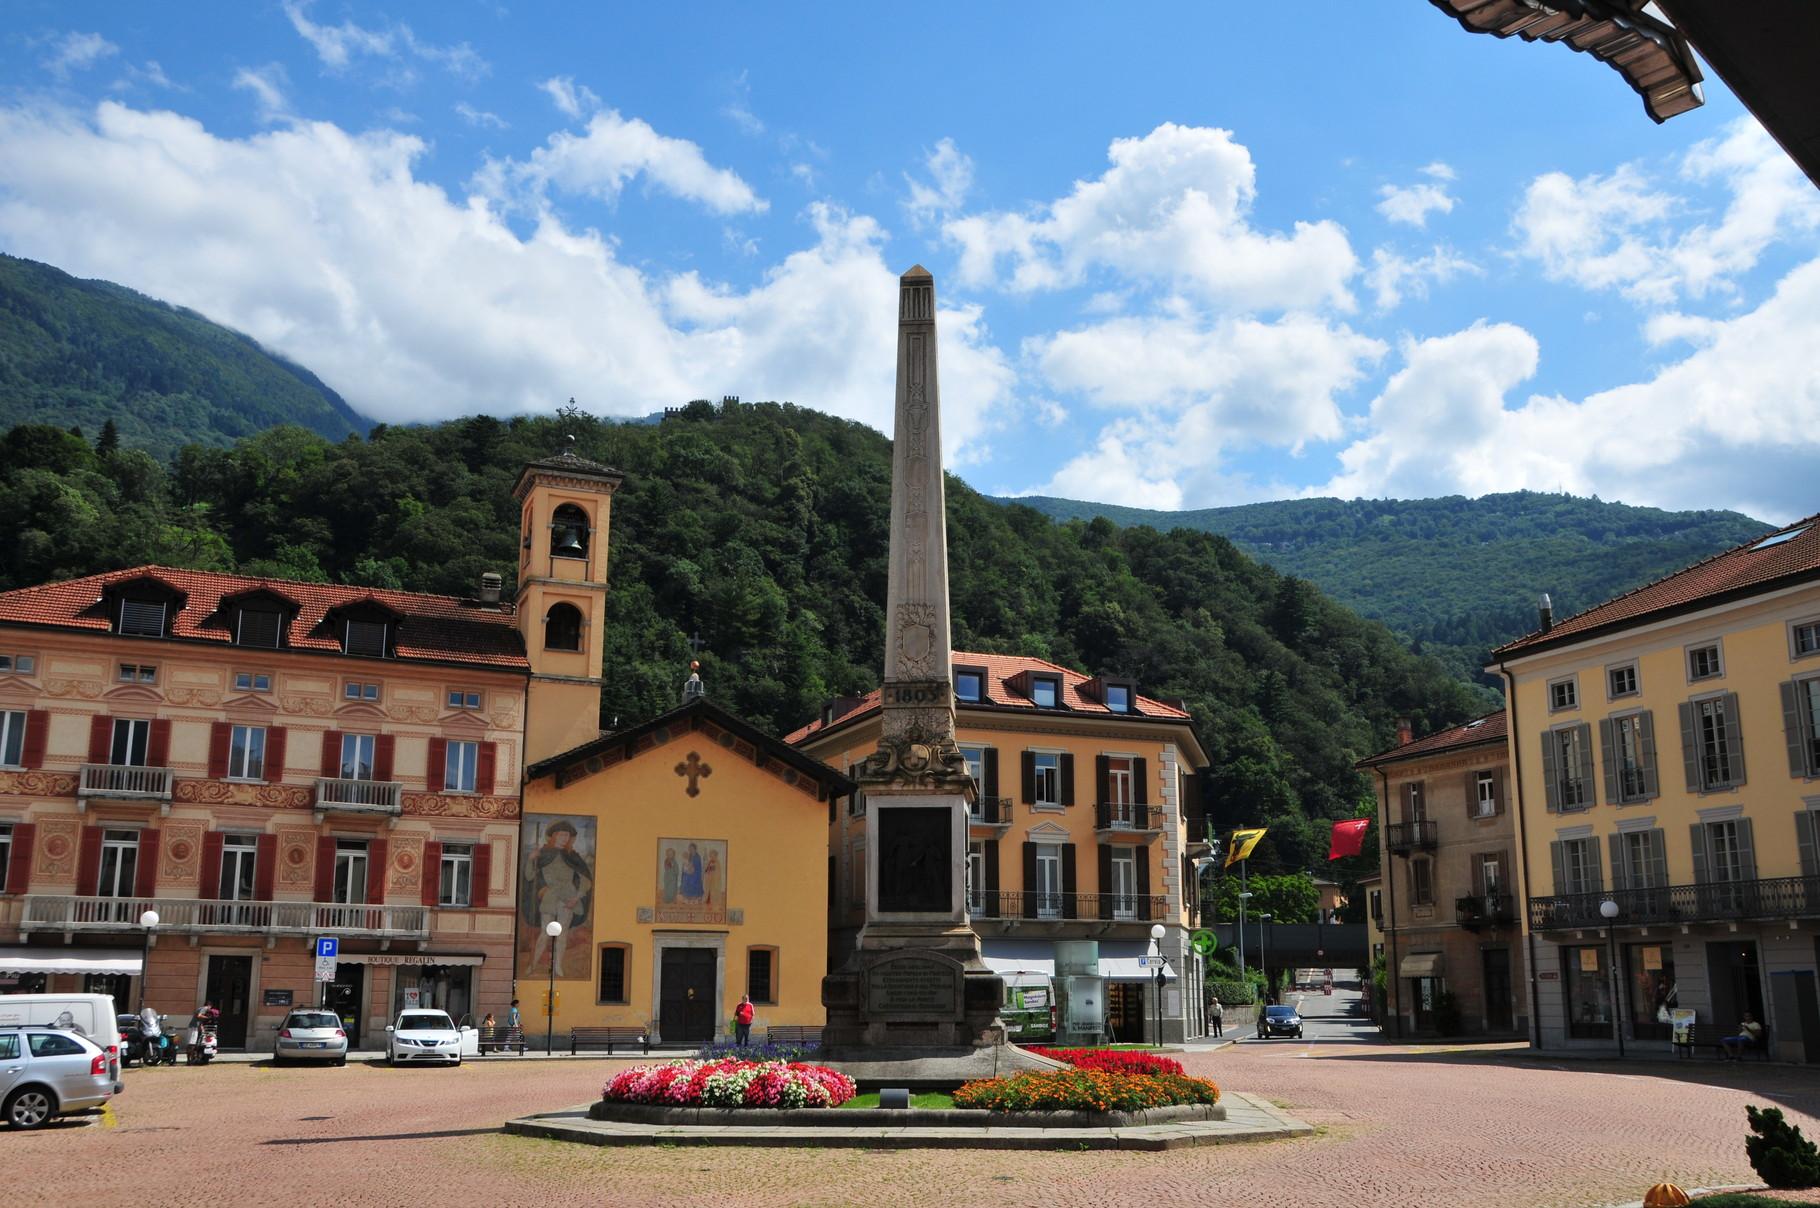 Chiesa San Rocco, Piazza Indipendenza, Bellinzona